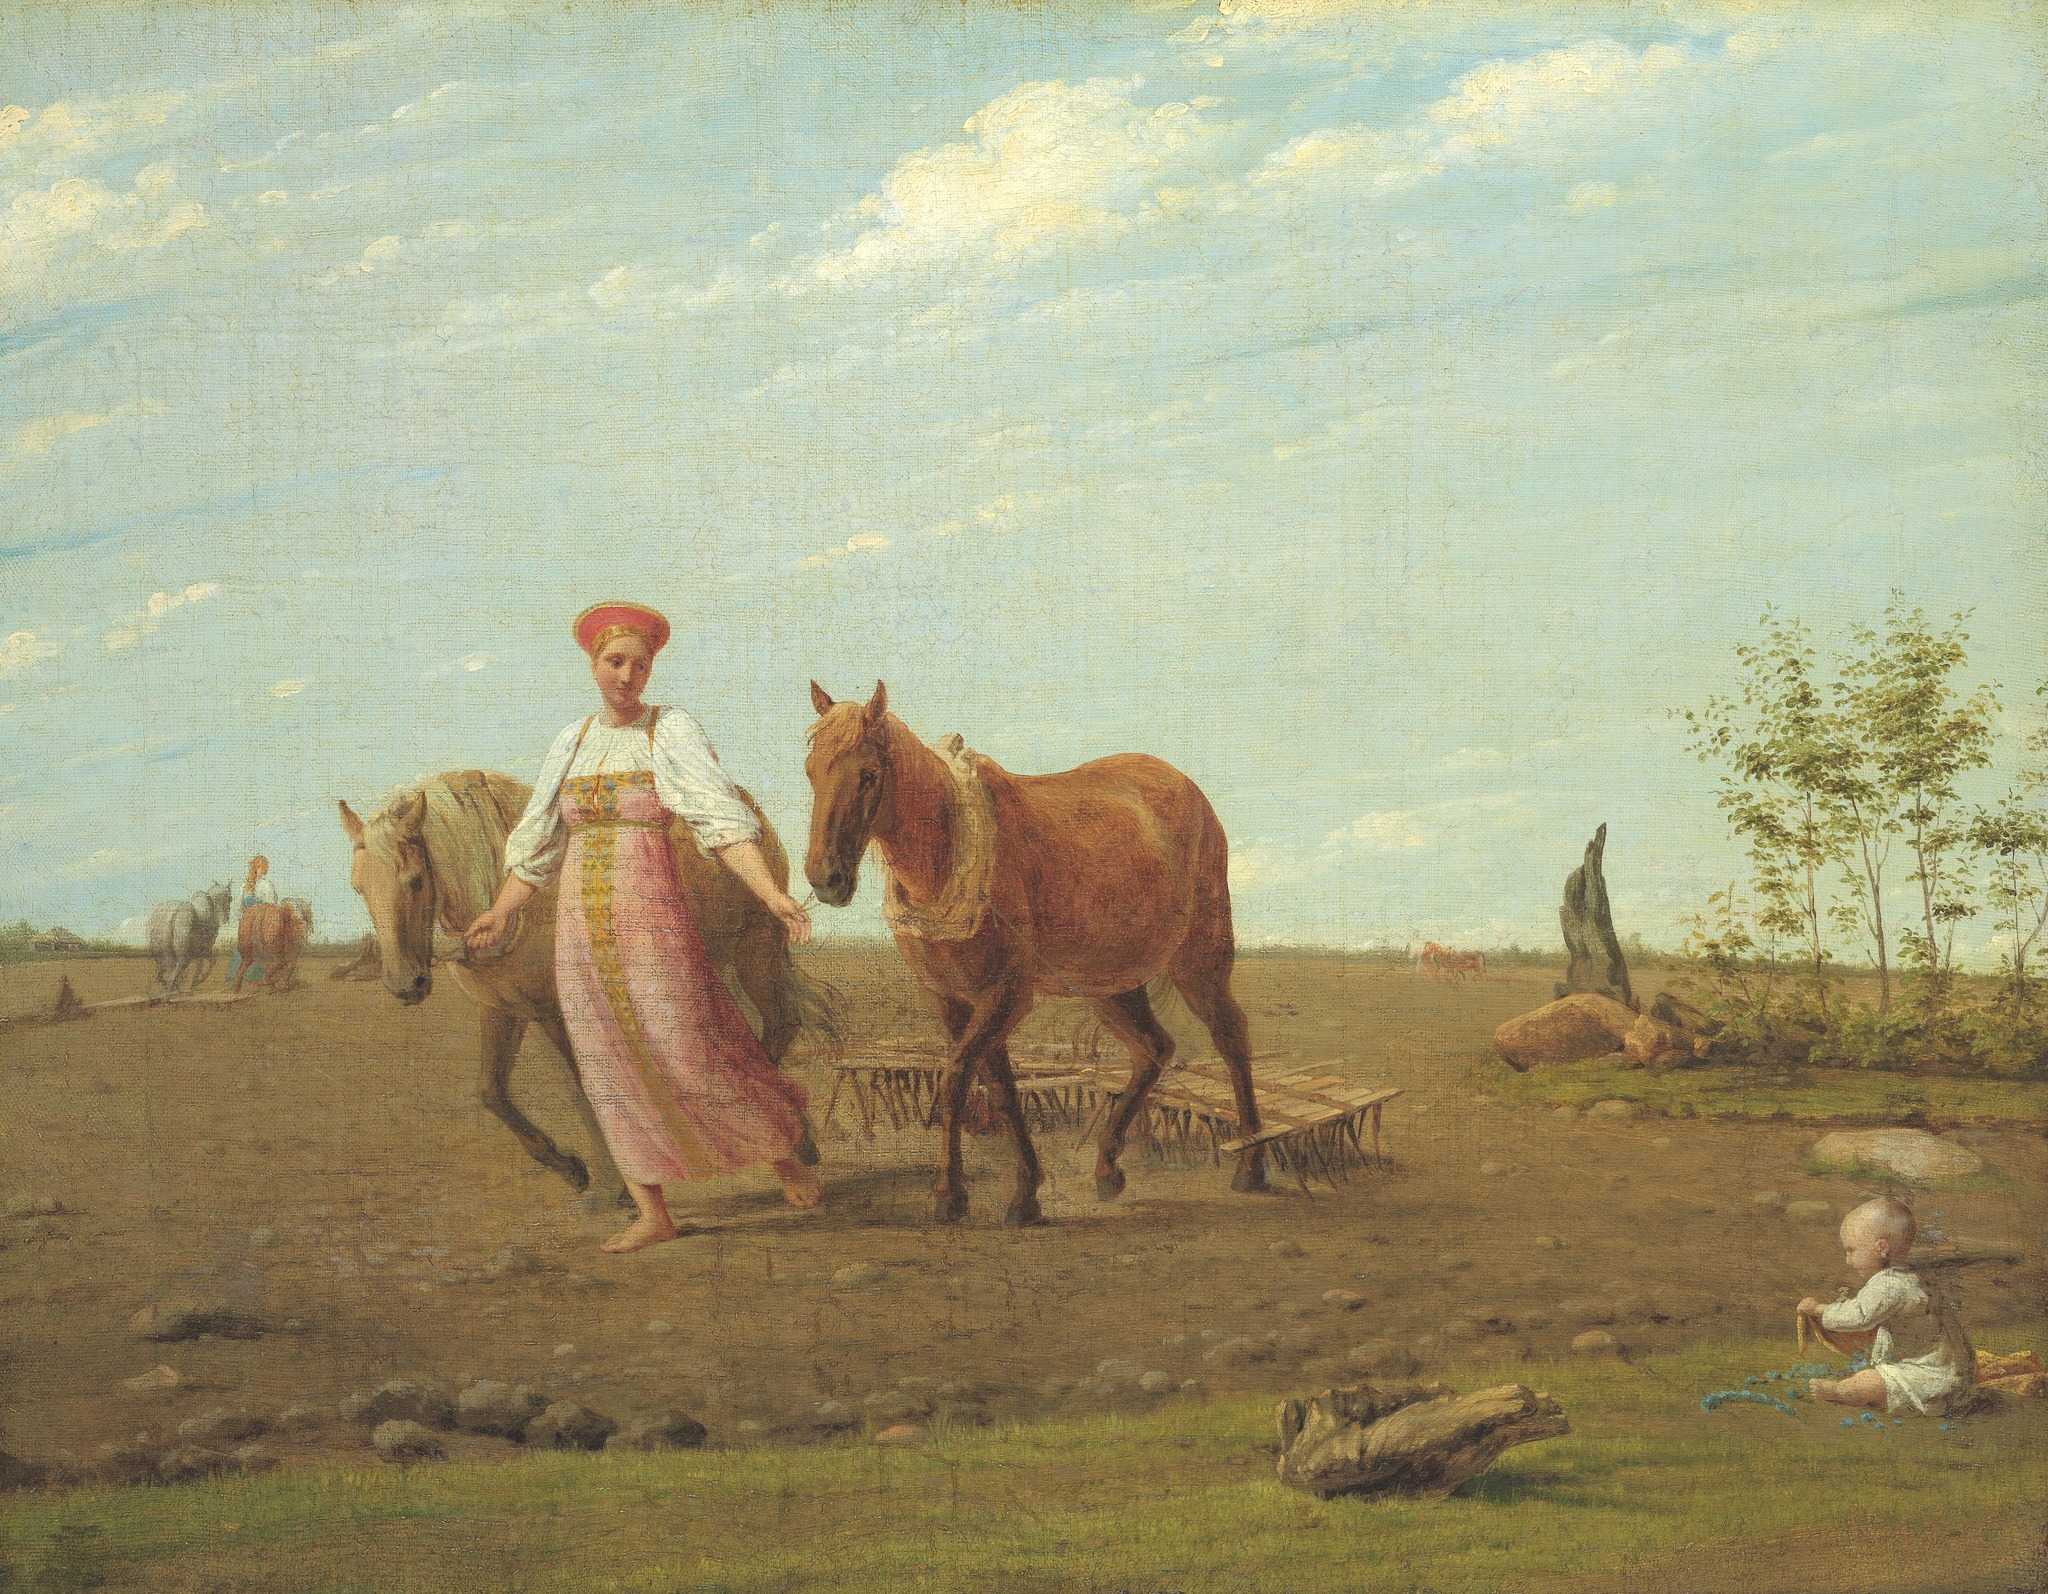 На пашне. Весна. Середина 1820-х. Государственная Третьяковская галерея